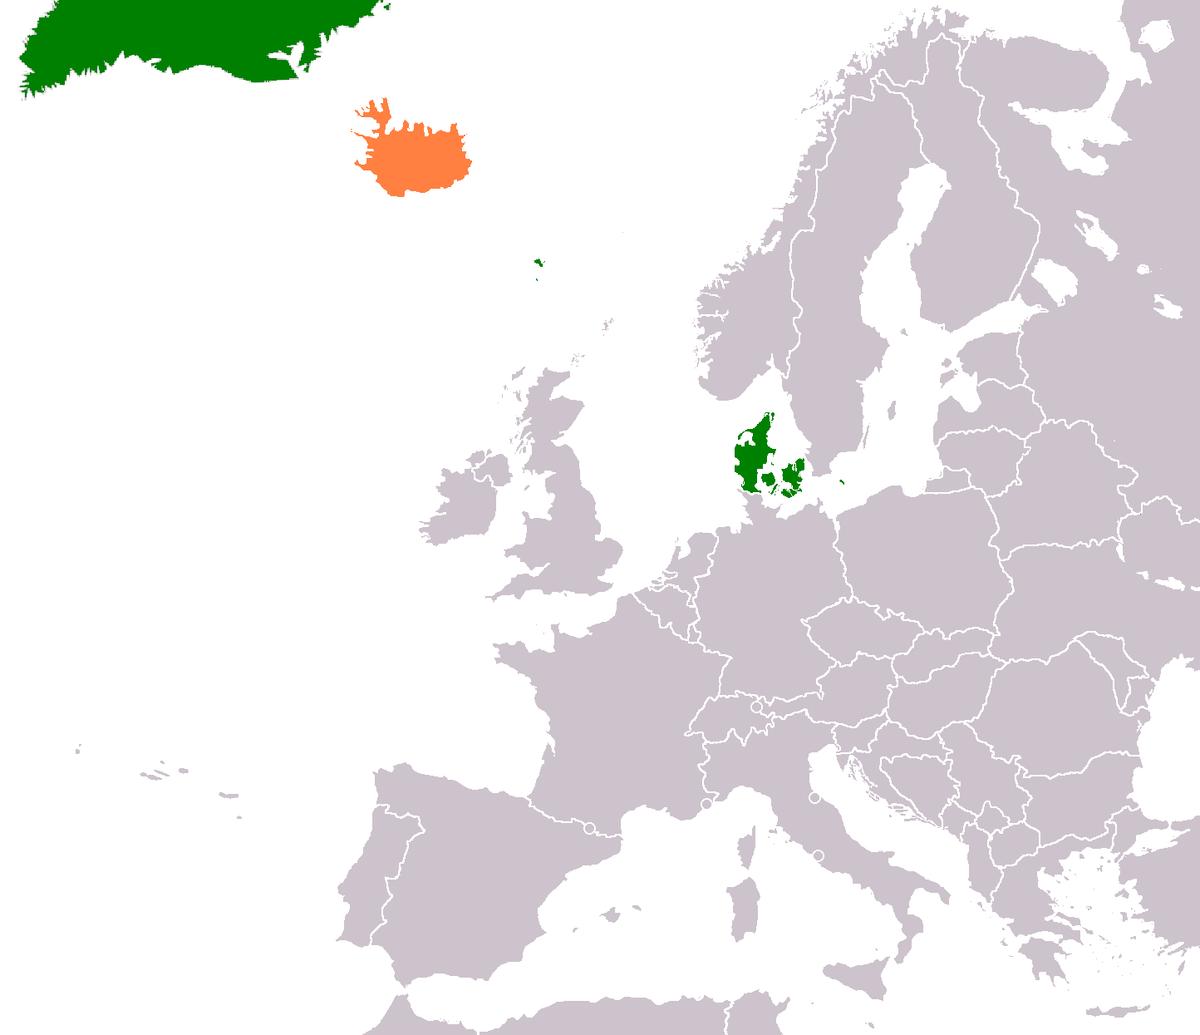 Denmarkiceland relations wikipedia gumiabroncs Choice Image